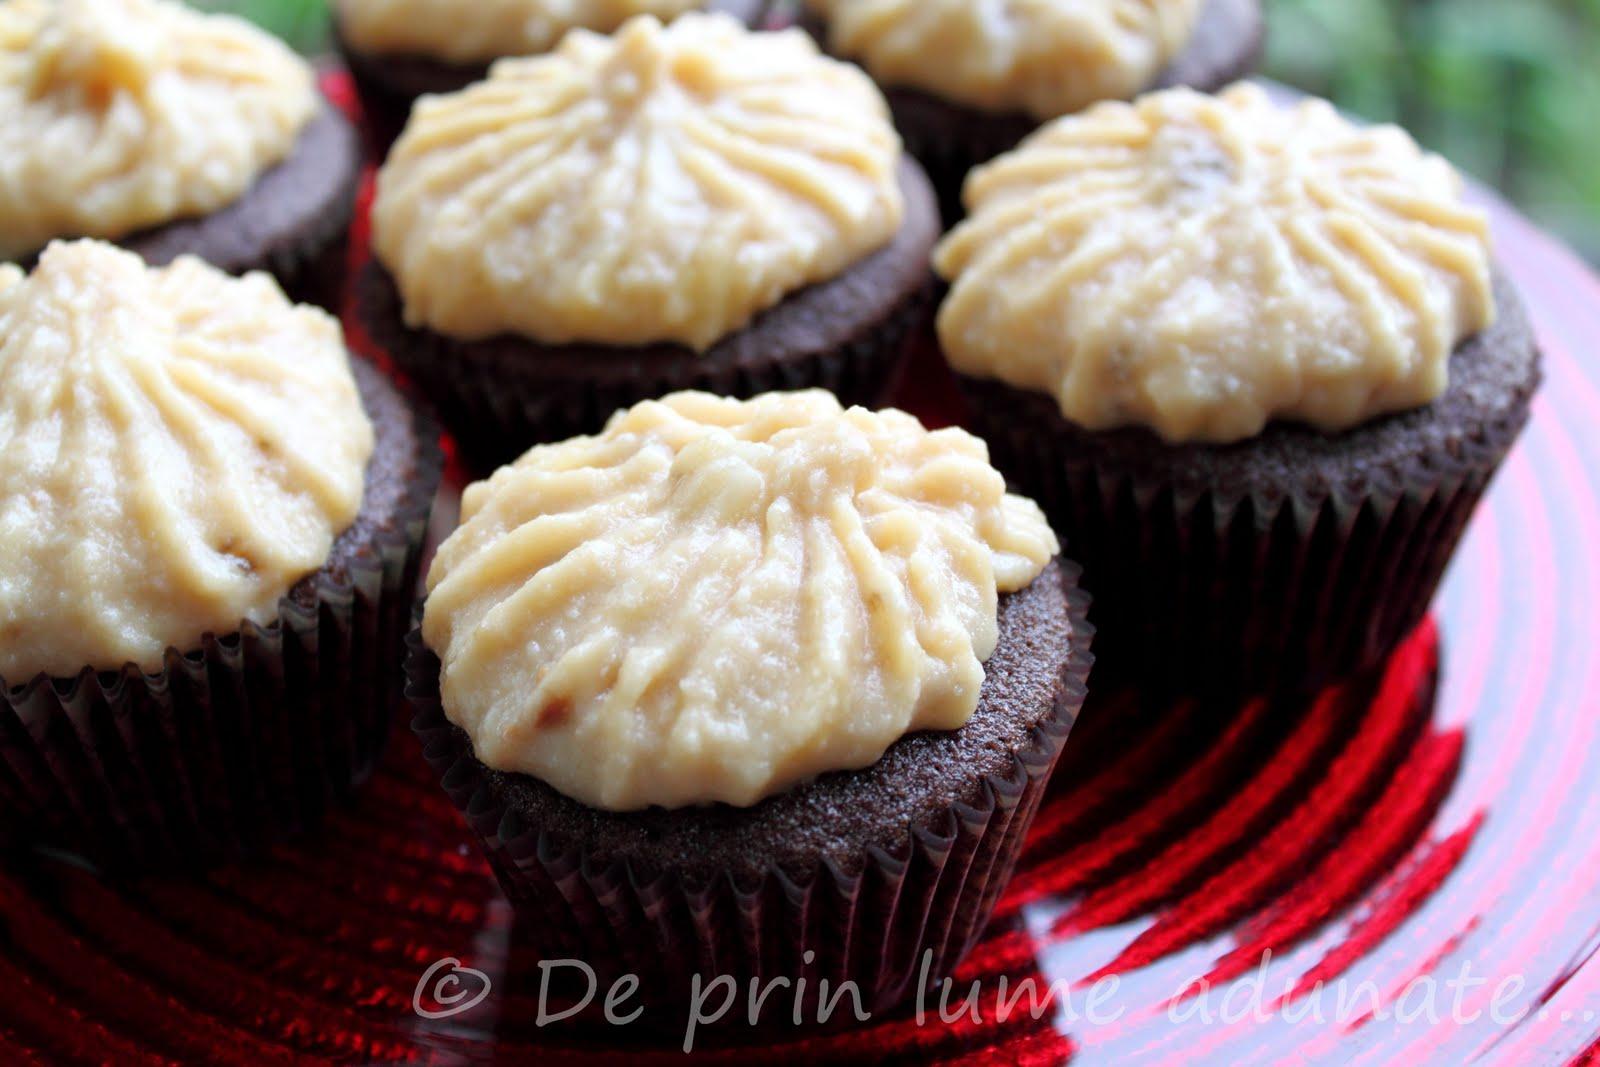 de banana si dulce de leche/ Chocolate cupcakes with banana and dulce ...